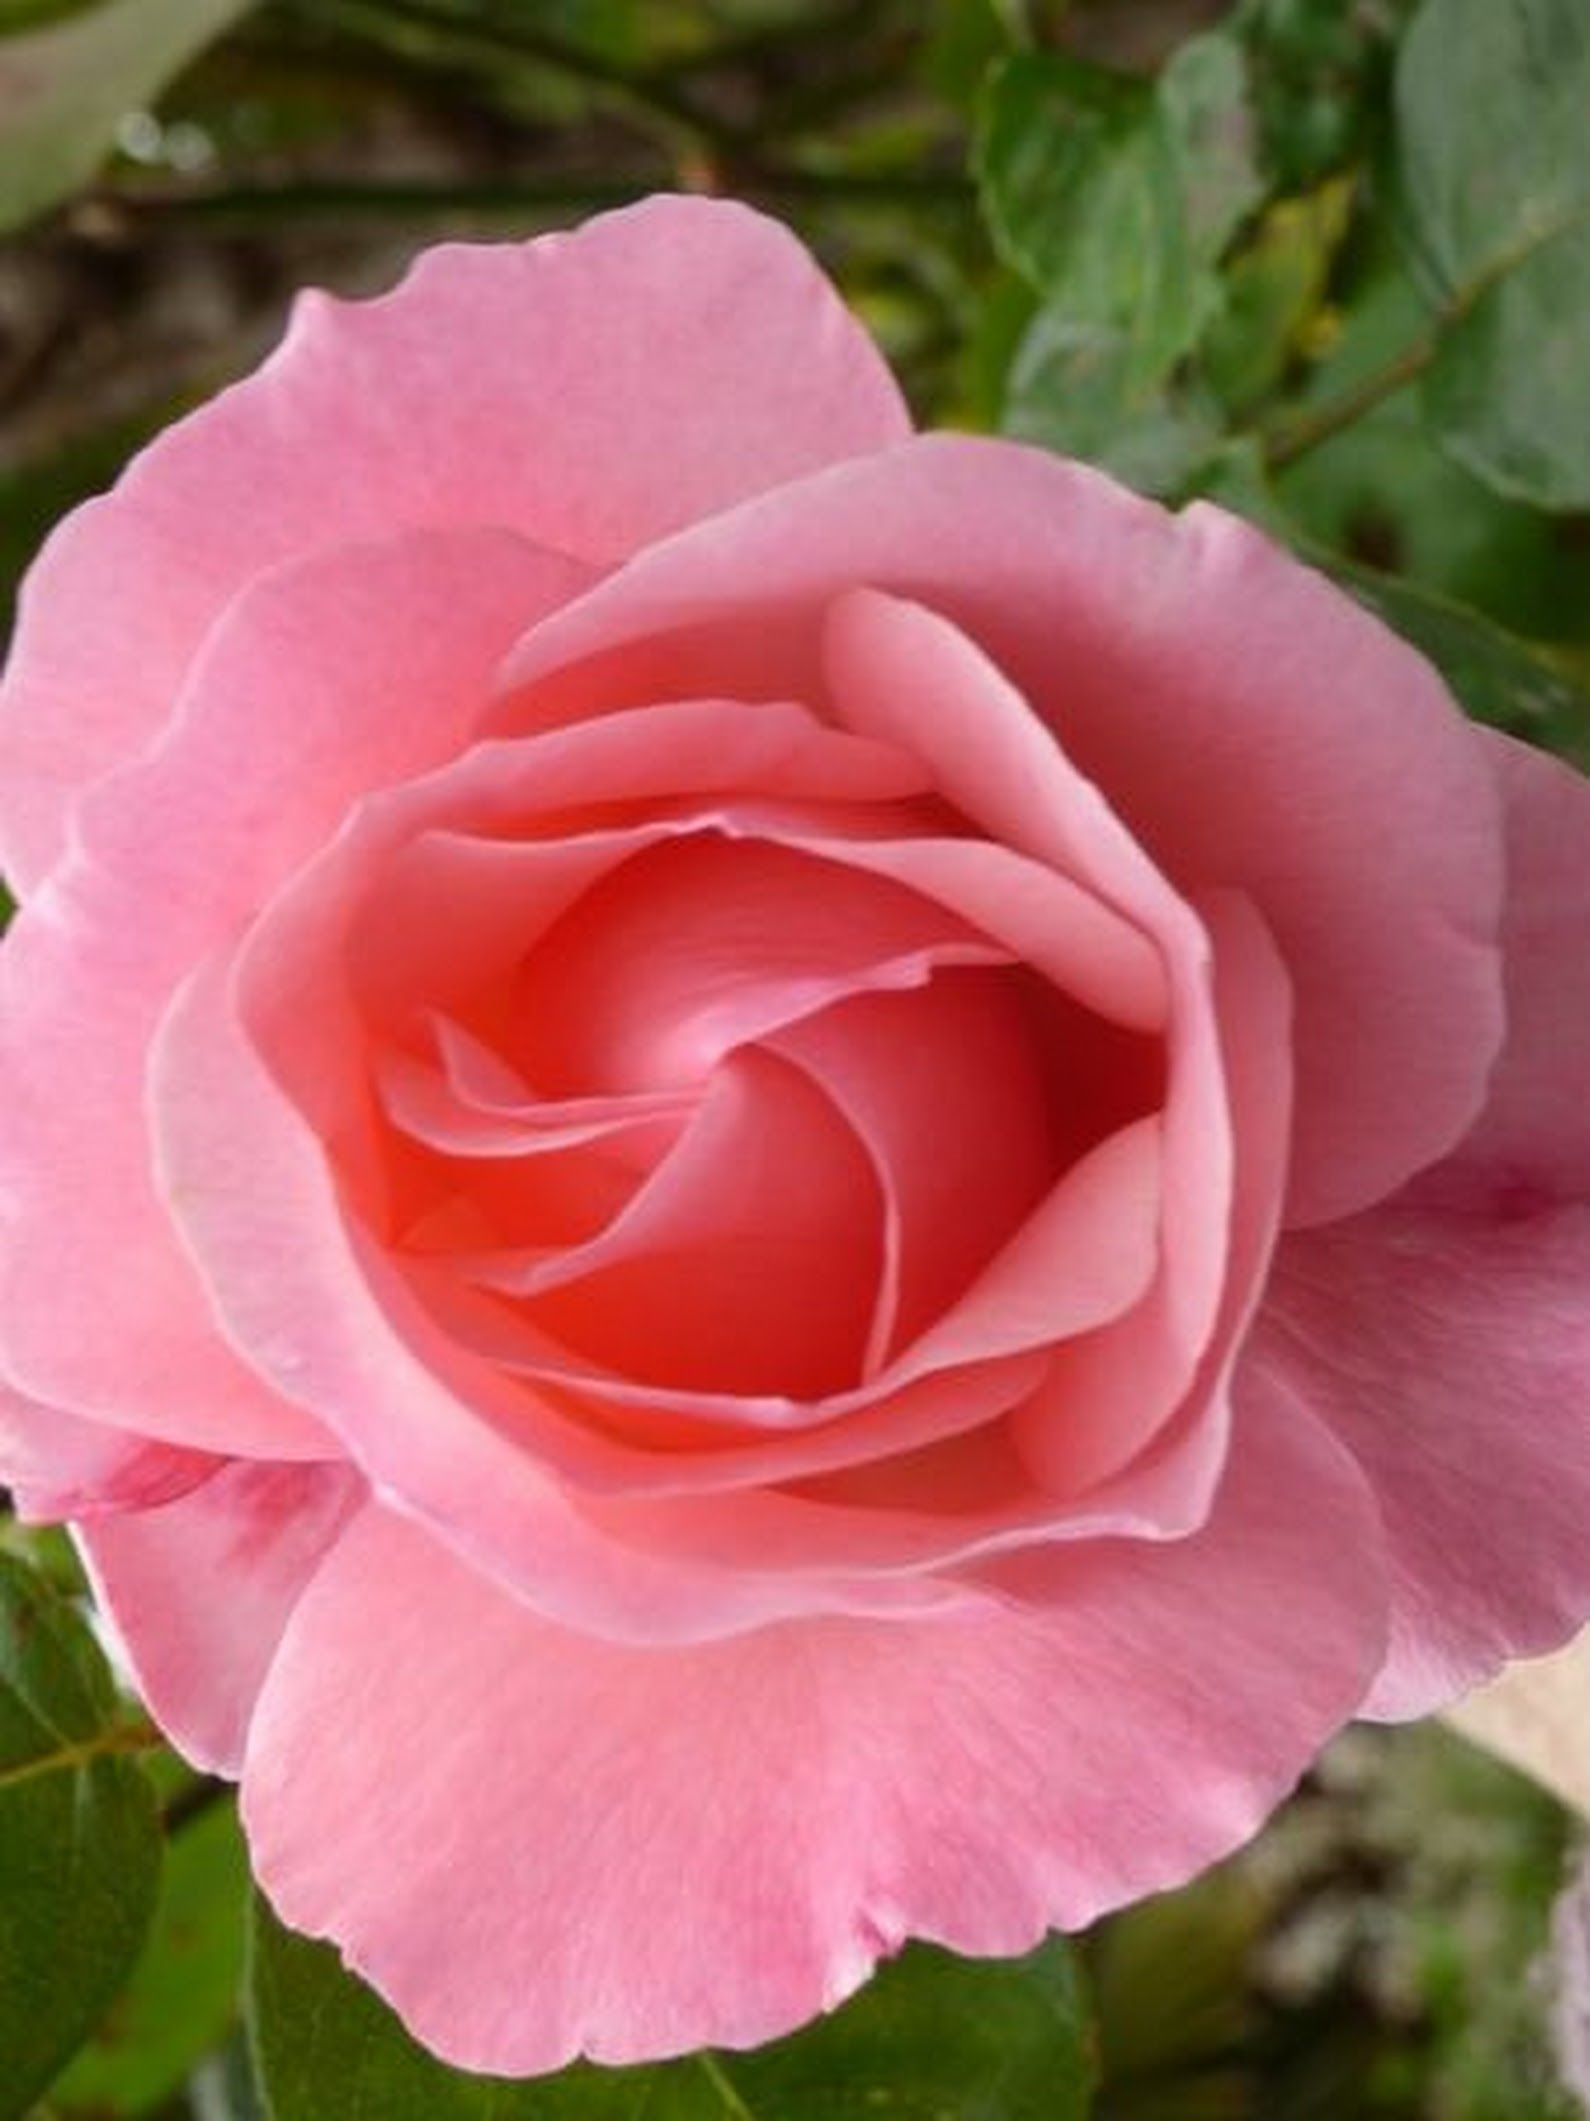 Pin by cynthia reece the purple iris on a rose is a rose is a rose is a rose by cynthiabreece photo izmirmasajfo